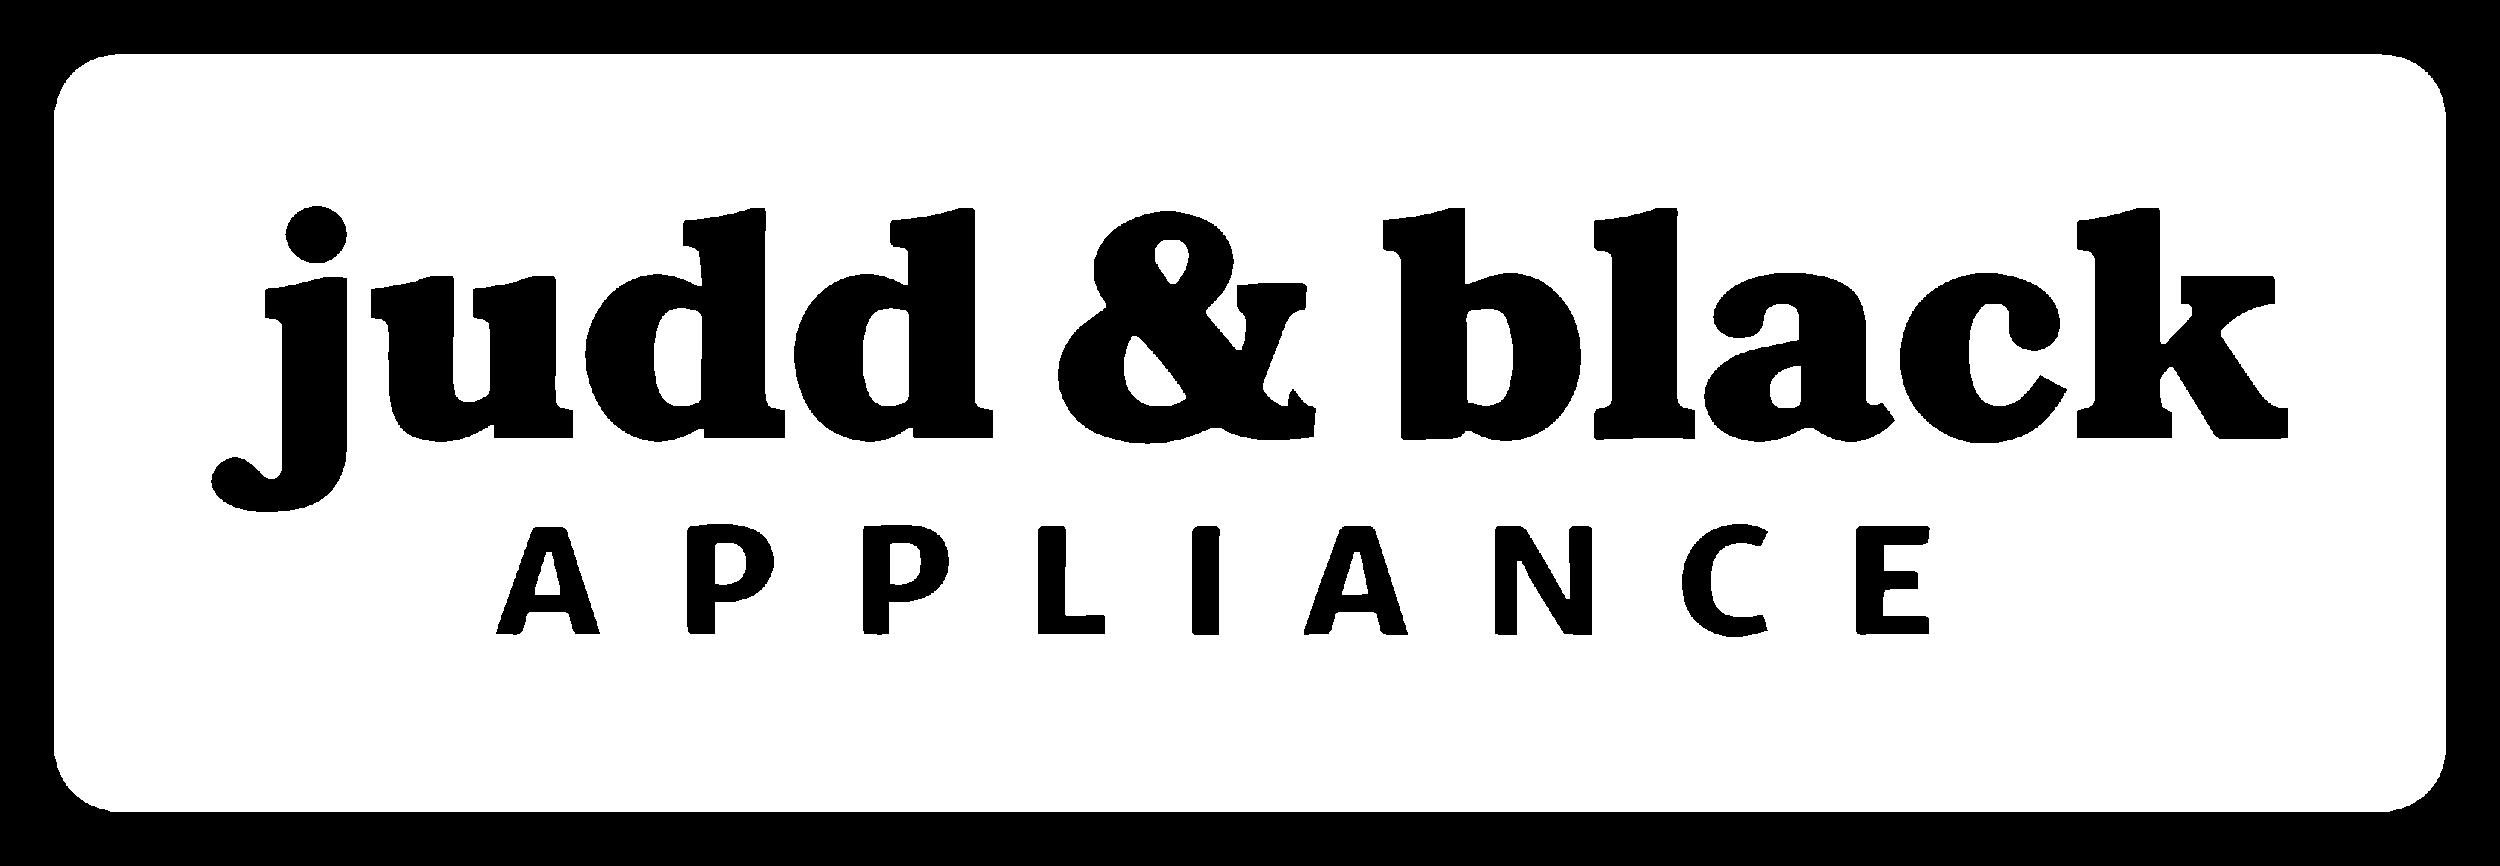 Judd and Black White logo transparent bg-01.png